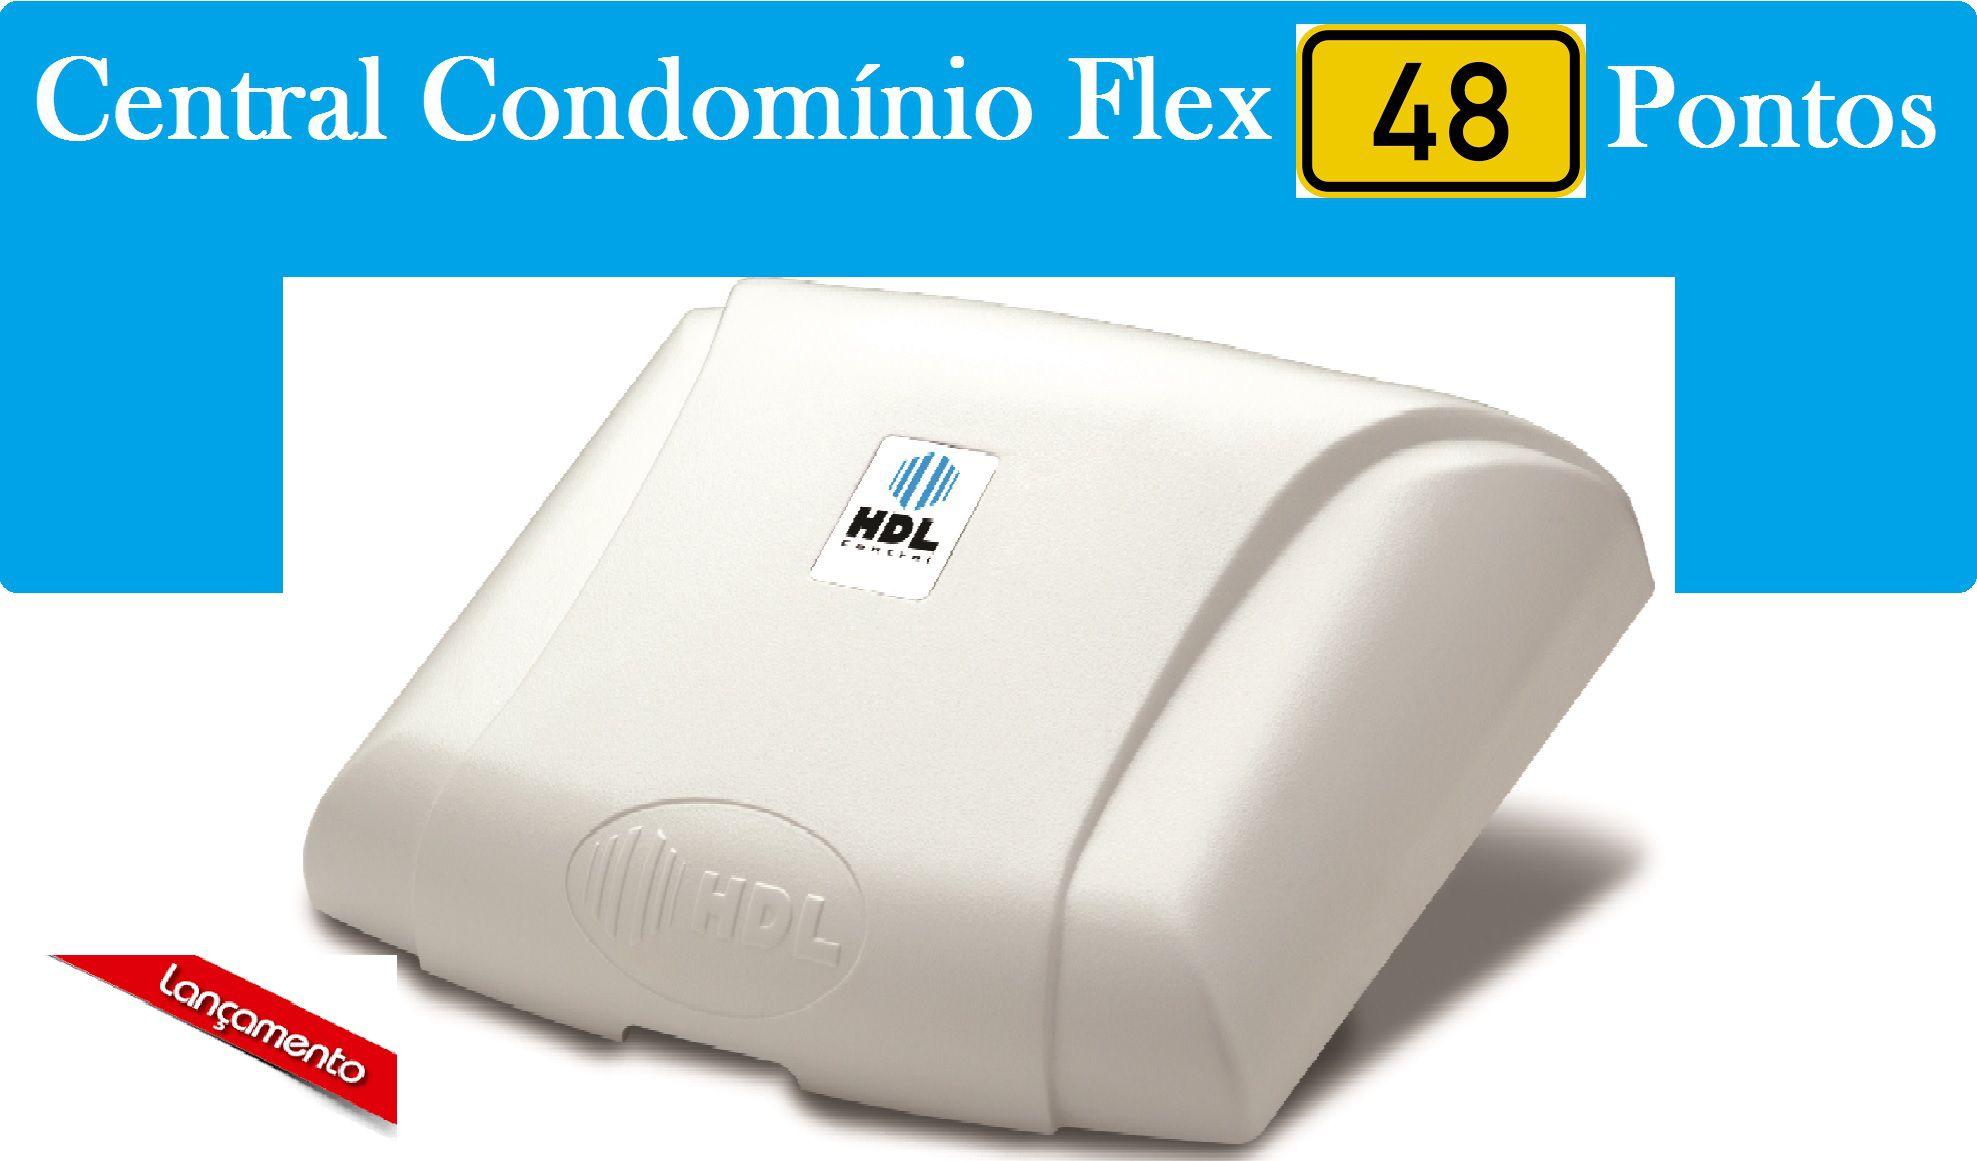 Central Hdl Flex 48p Montada 48 Ramais de Interfonia HDL